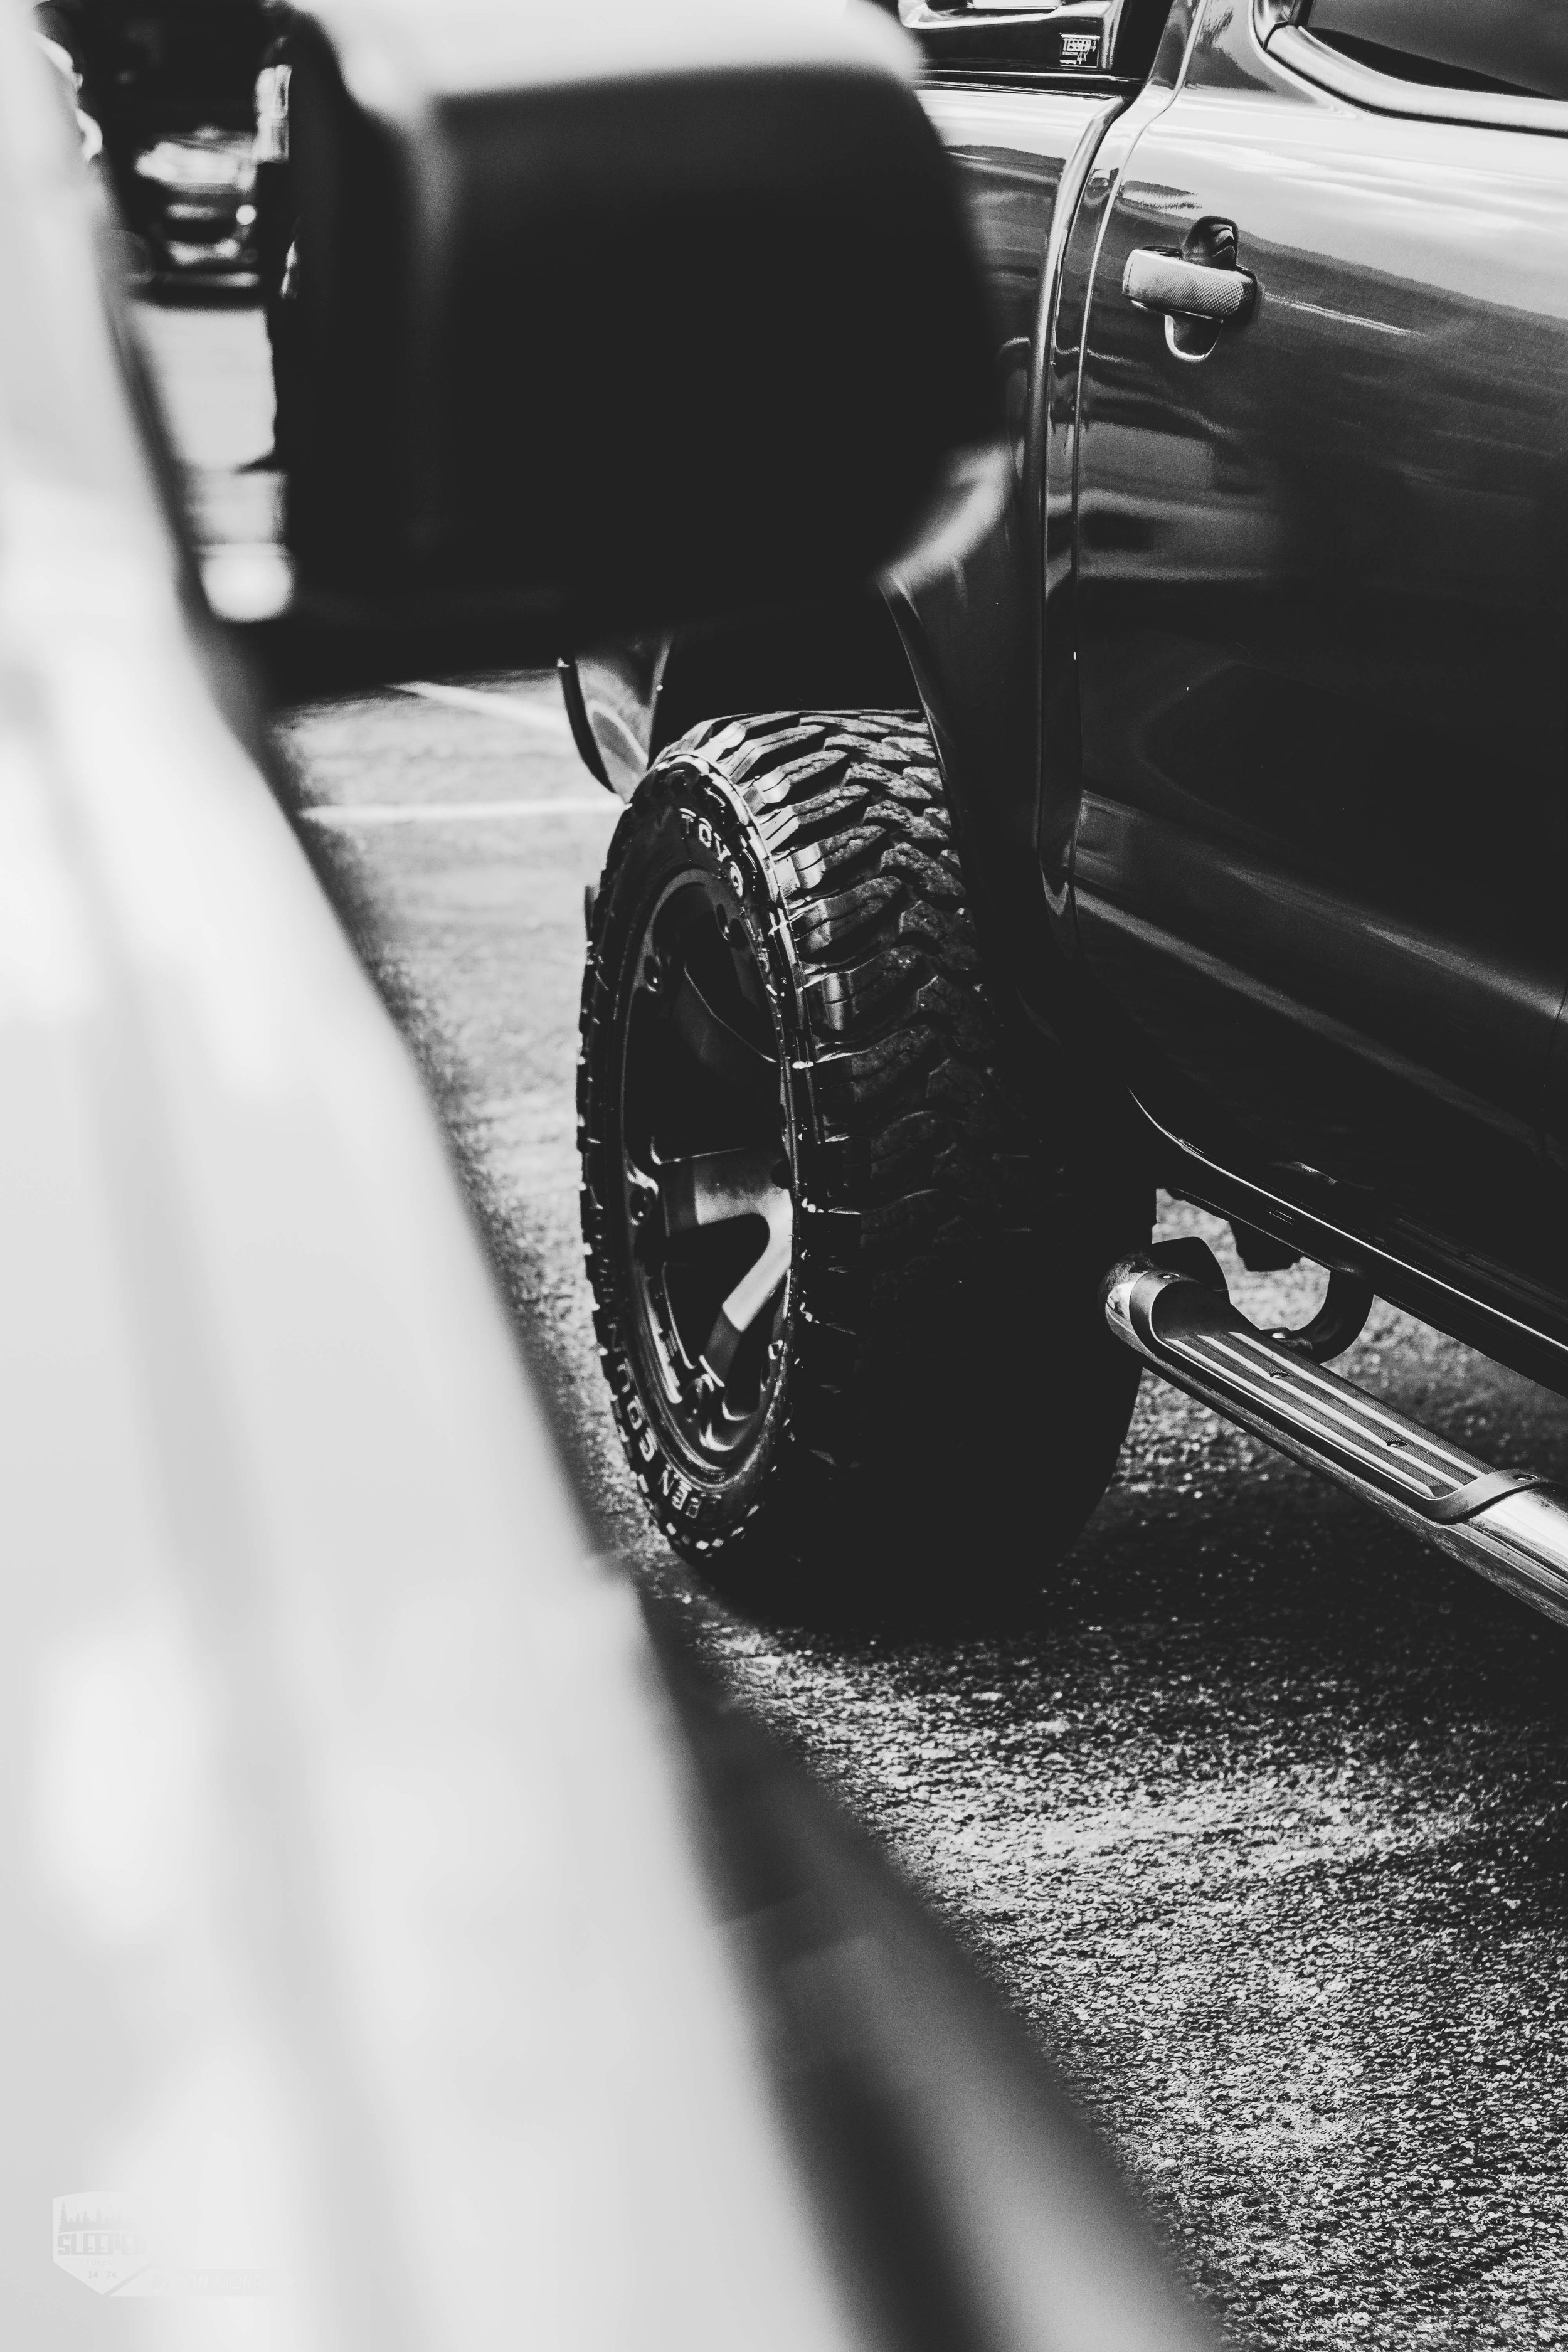 Rep_ya_ride_2019_barbados_car_culture-13.jpg